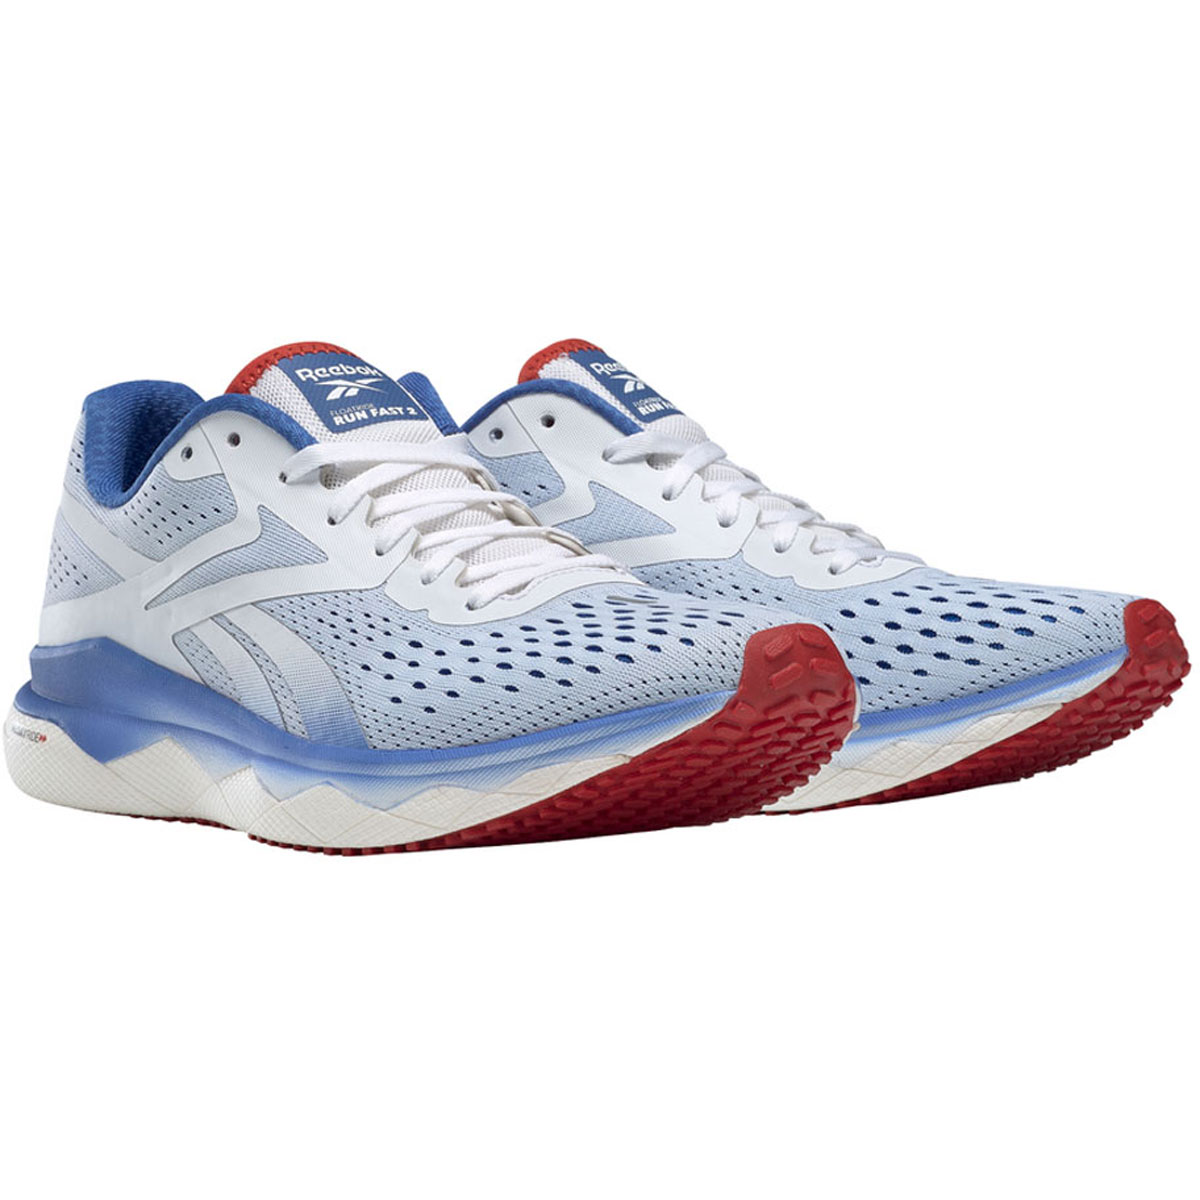 Men's Reebok Floatride Run Fast 2.0 Running Shoe - Color: White/Blue Blast Legacy Red (Regular Width) - Size: 8.5, White/Blue Blast Legacy Red, large, image 2